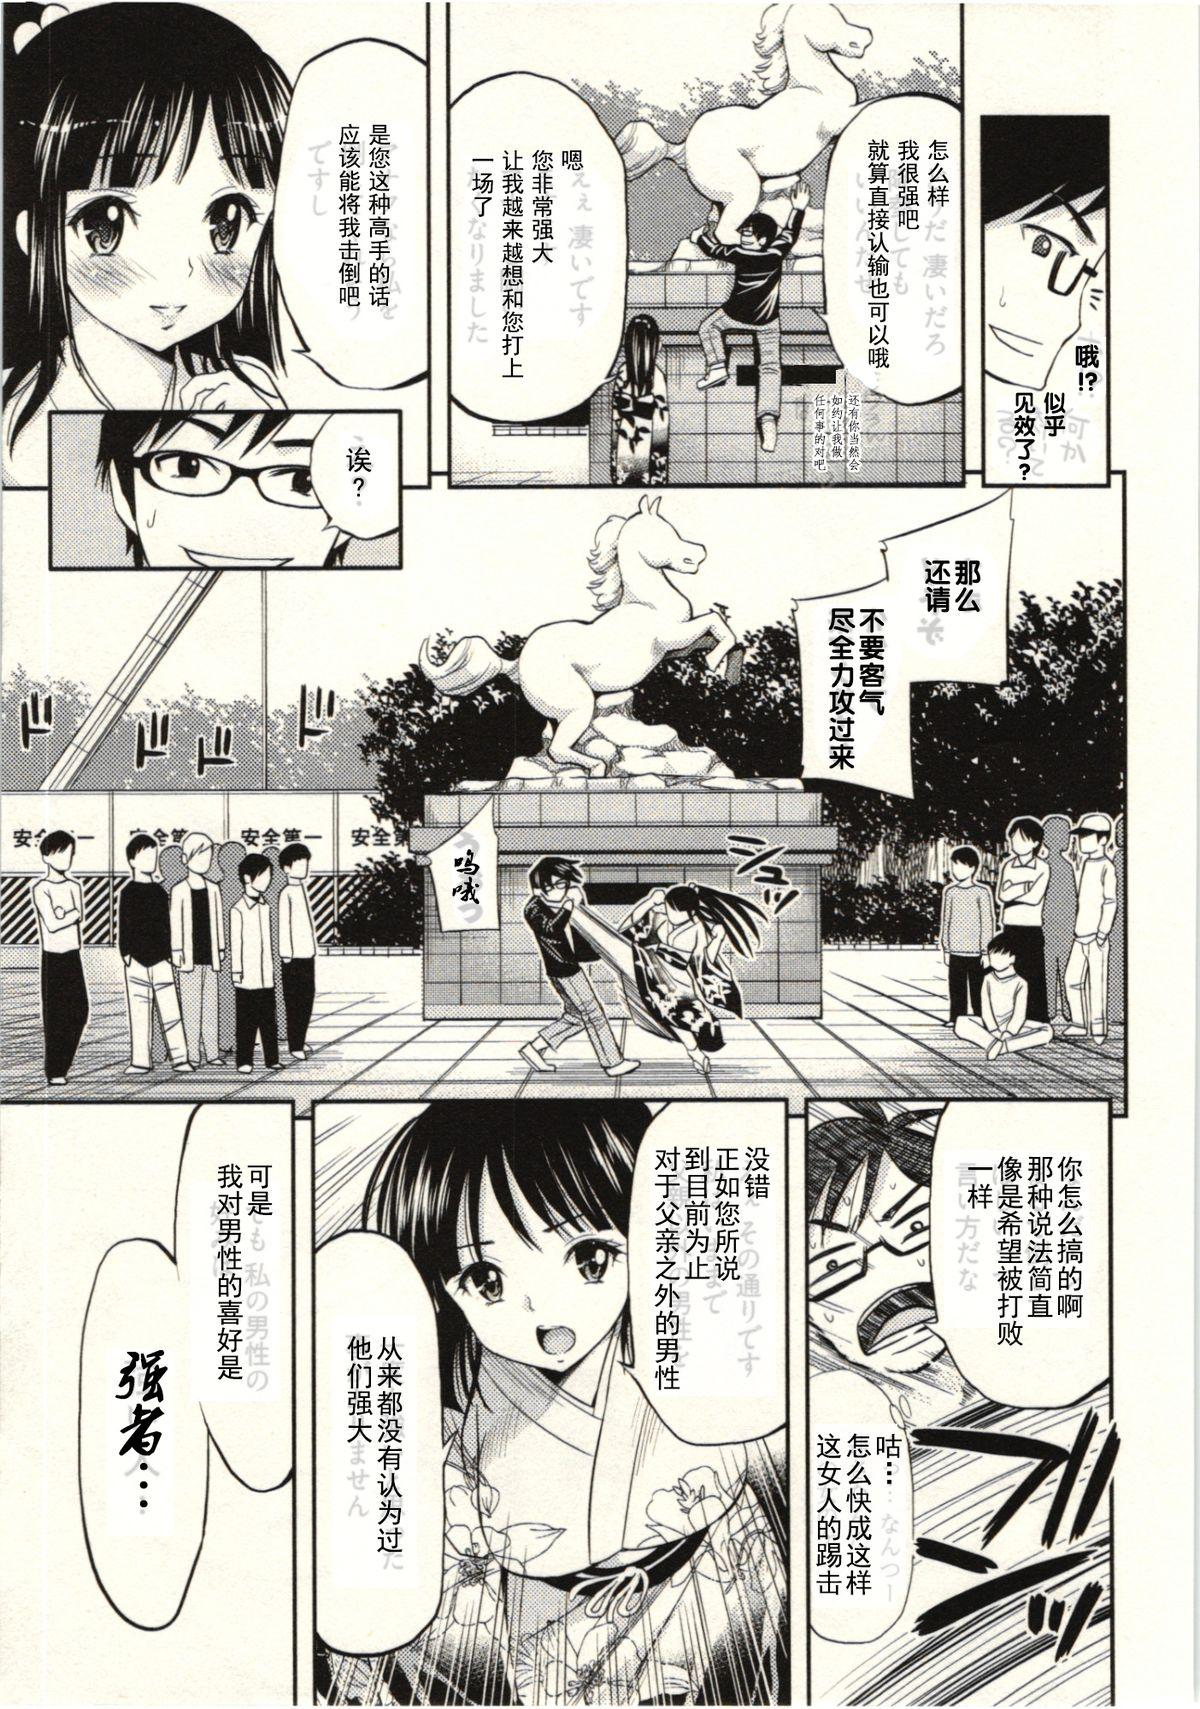 Tadashii Majutsu no Asobikata - The right way of playing of magic. 111